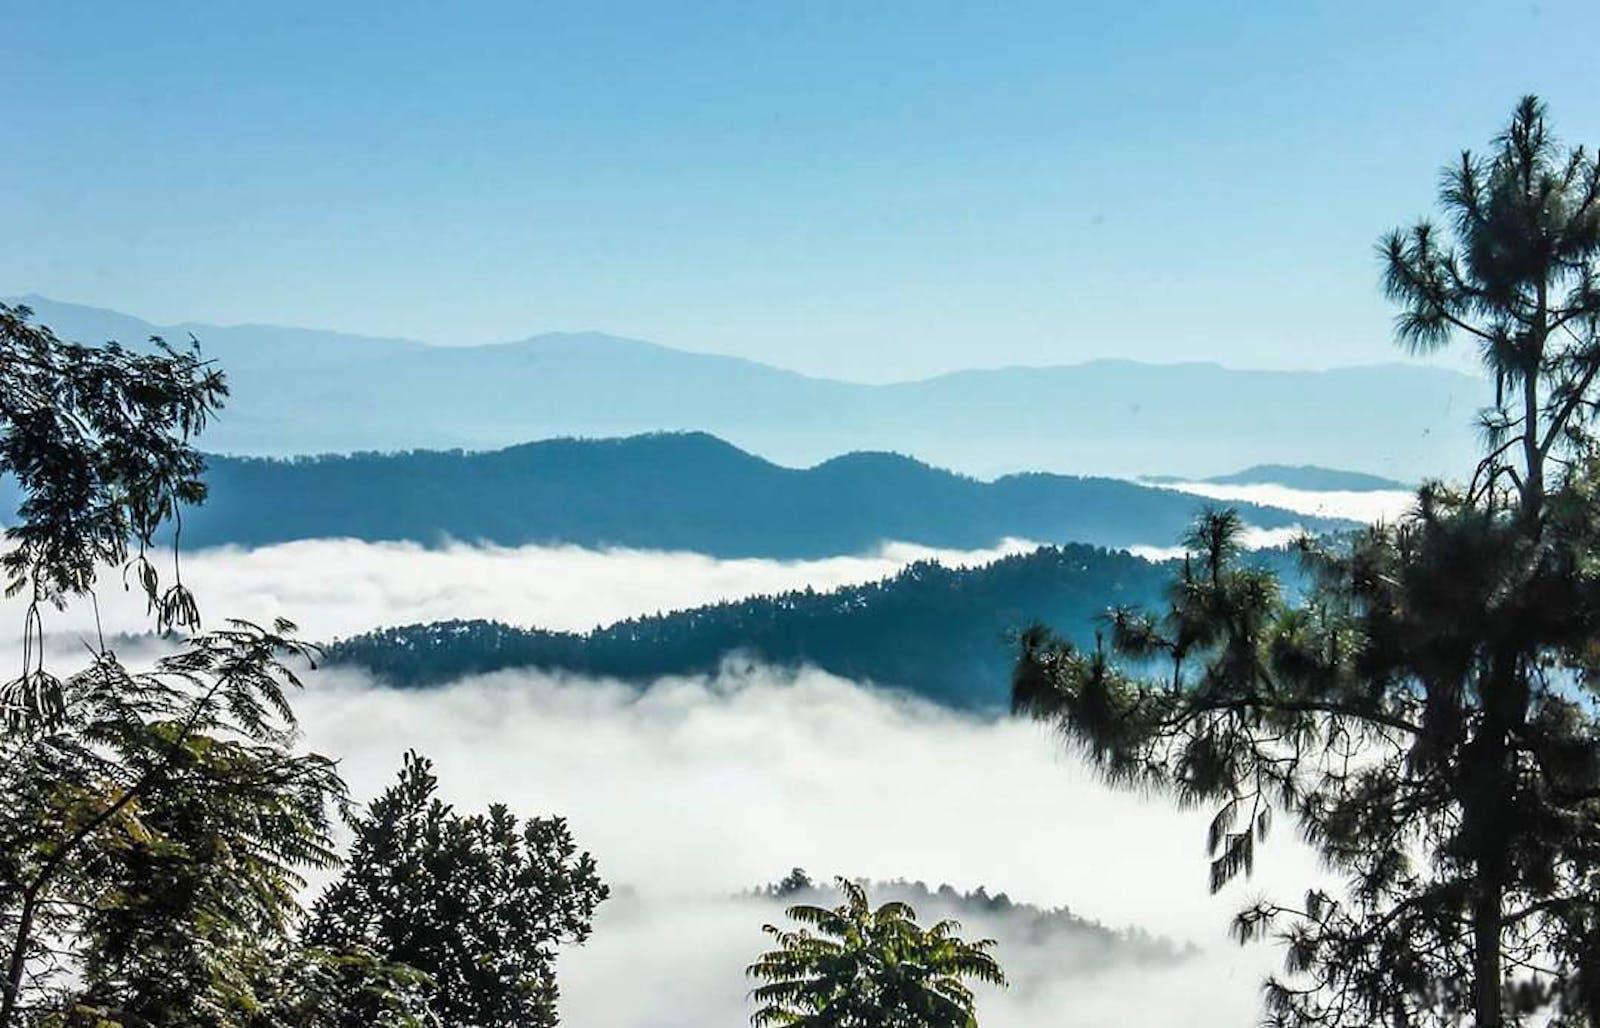 Northeast India-Myanmar Pine Forests